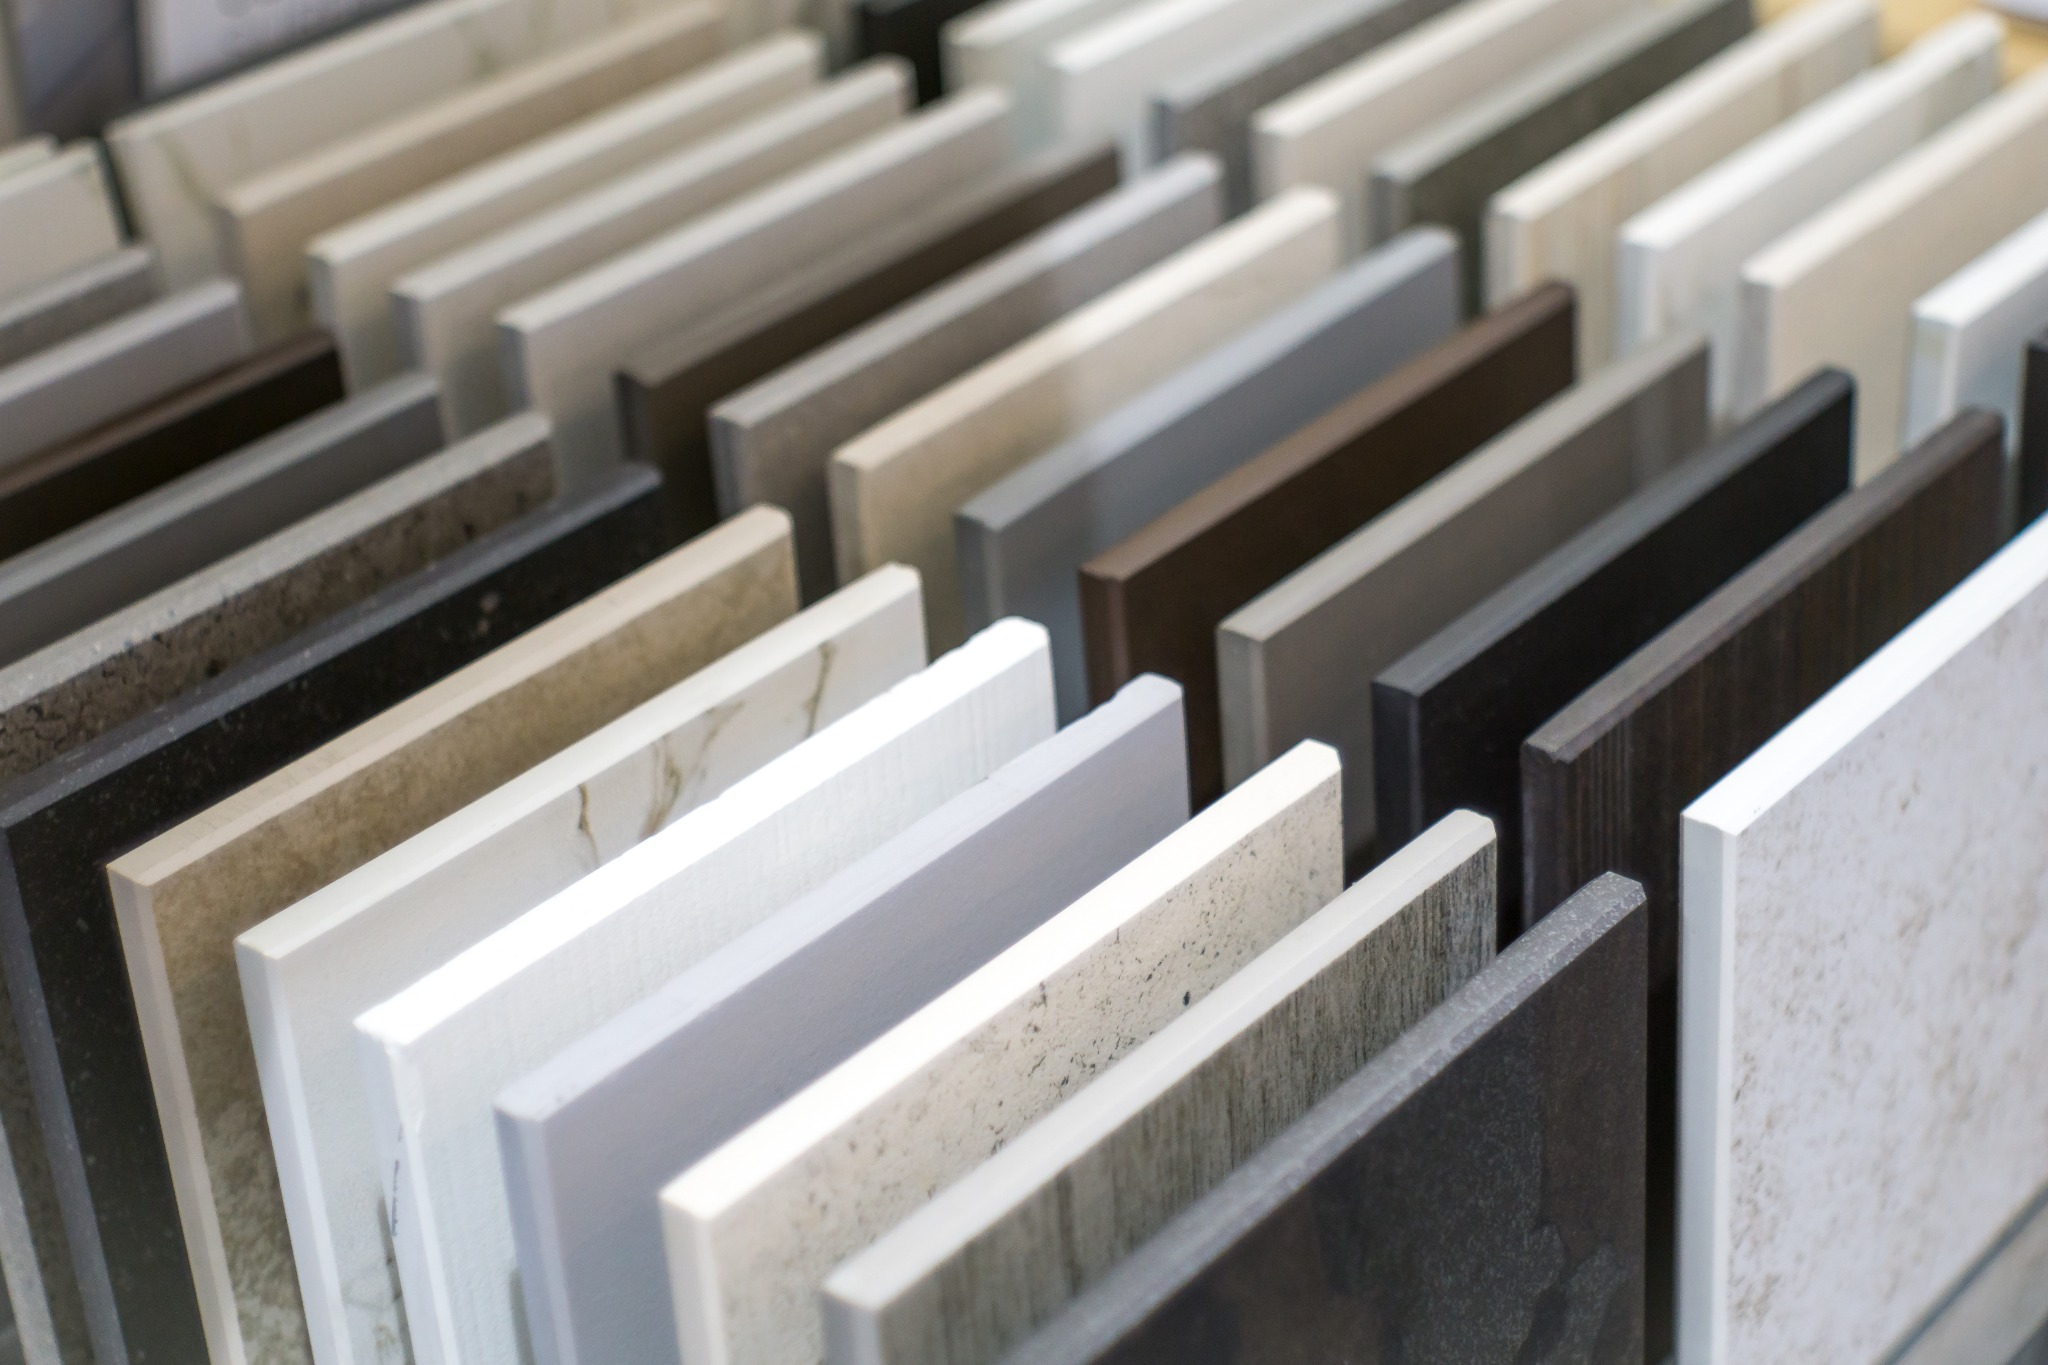 Different samples of various countertop materials.